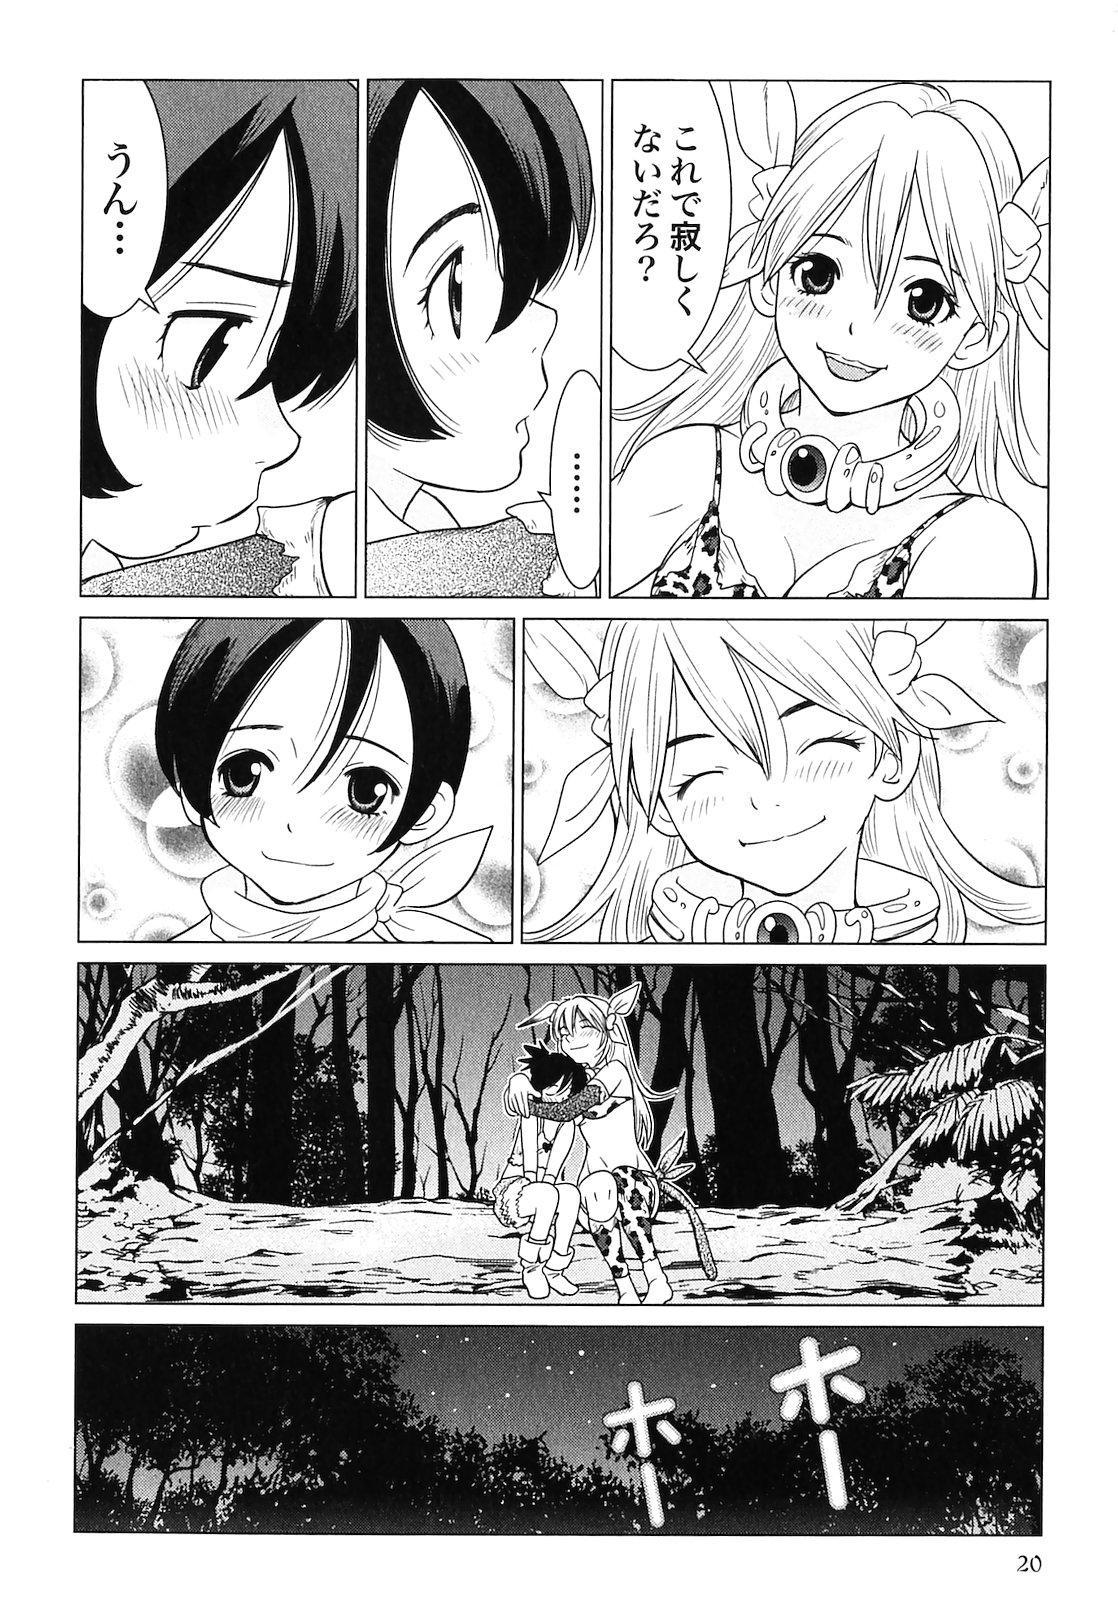 Makyo no Shanana Vol.02 21